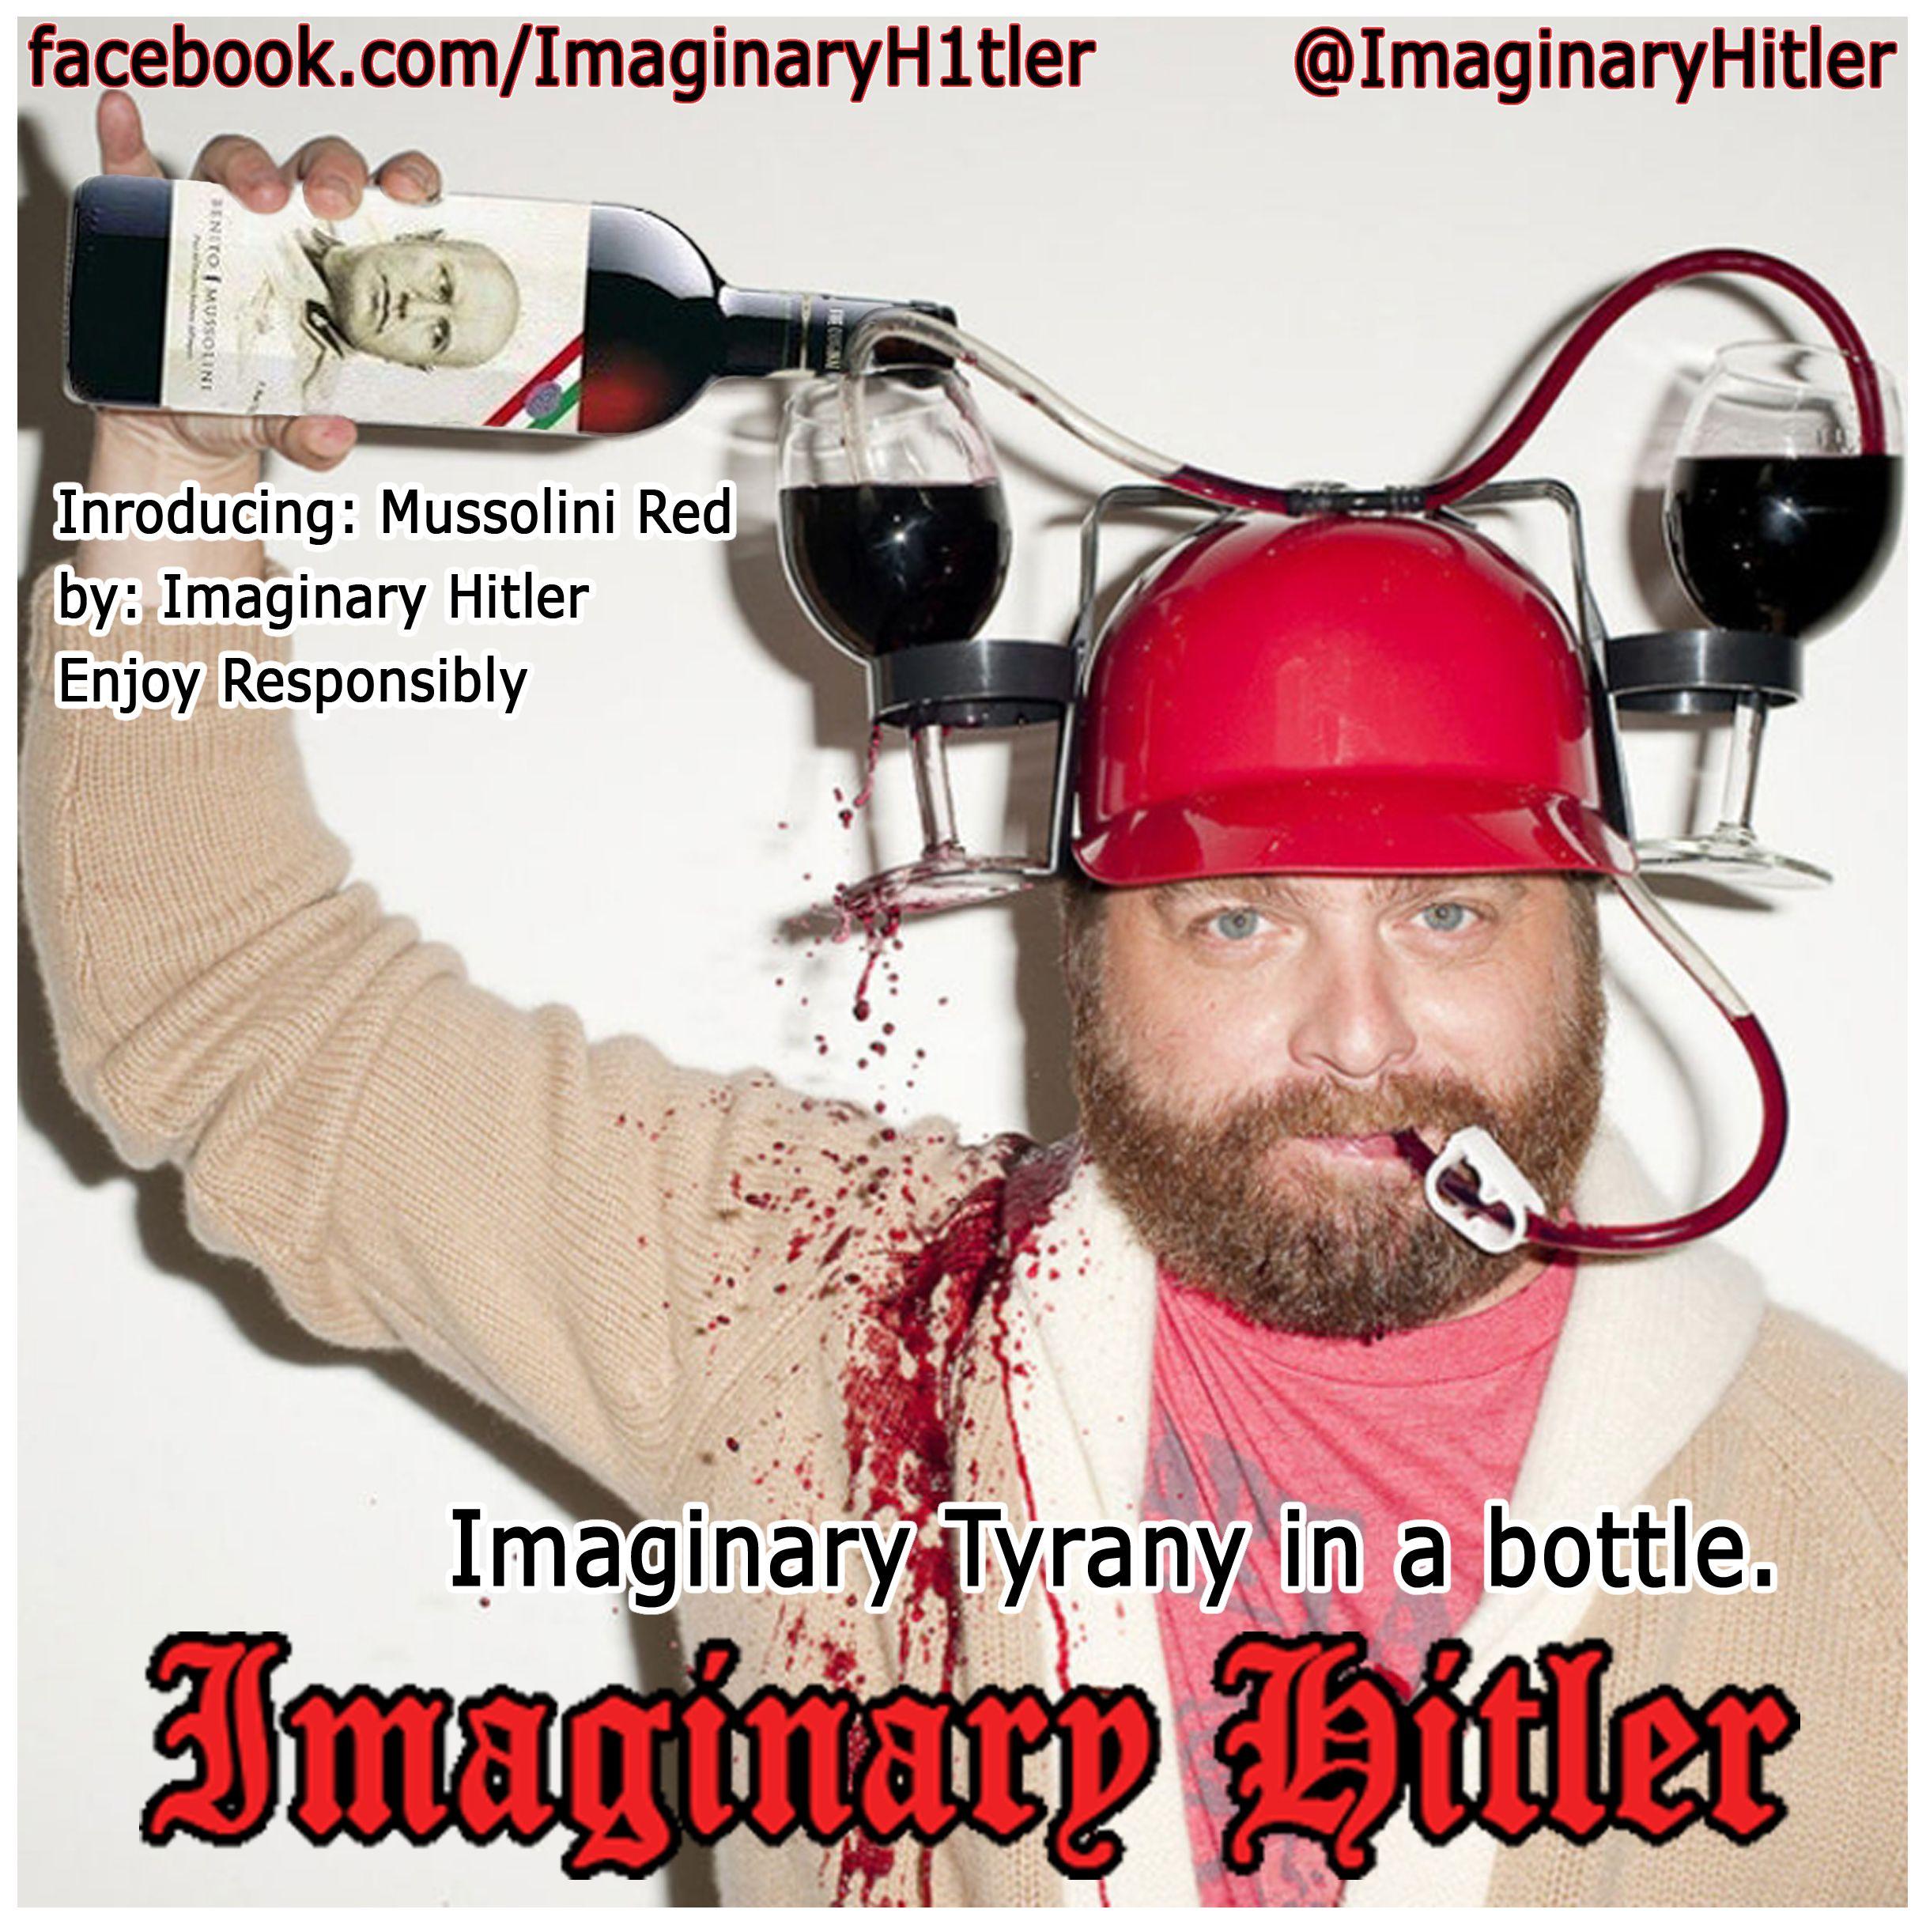 Pin On Imaginary Hitler S Imaginary Tyrannical Regime S Propaganda